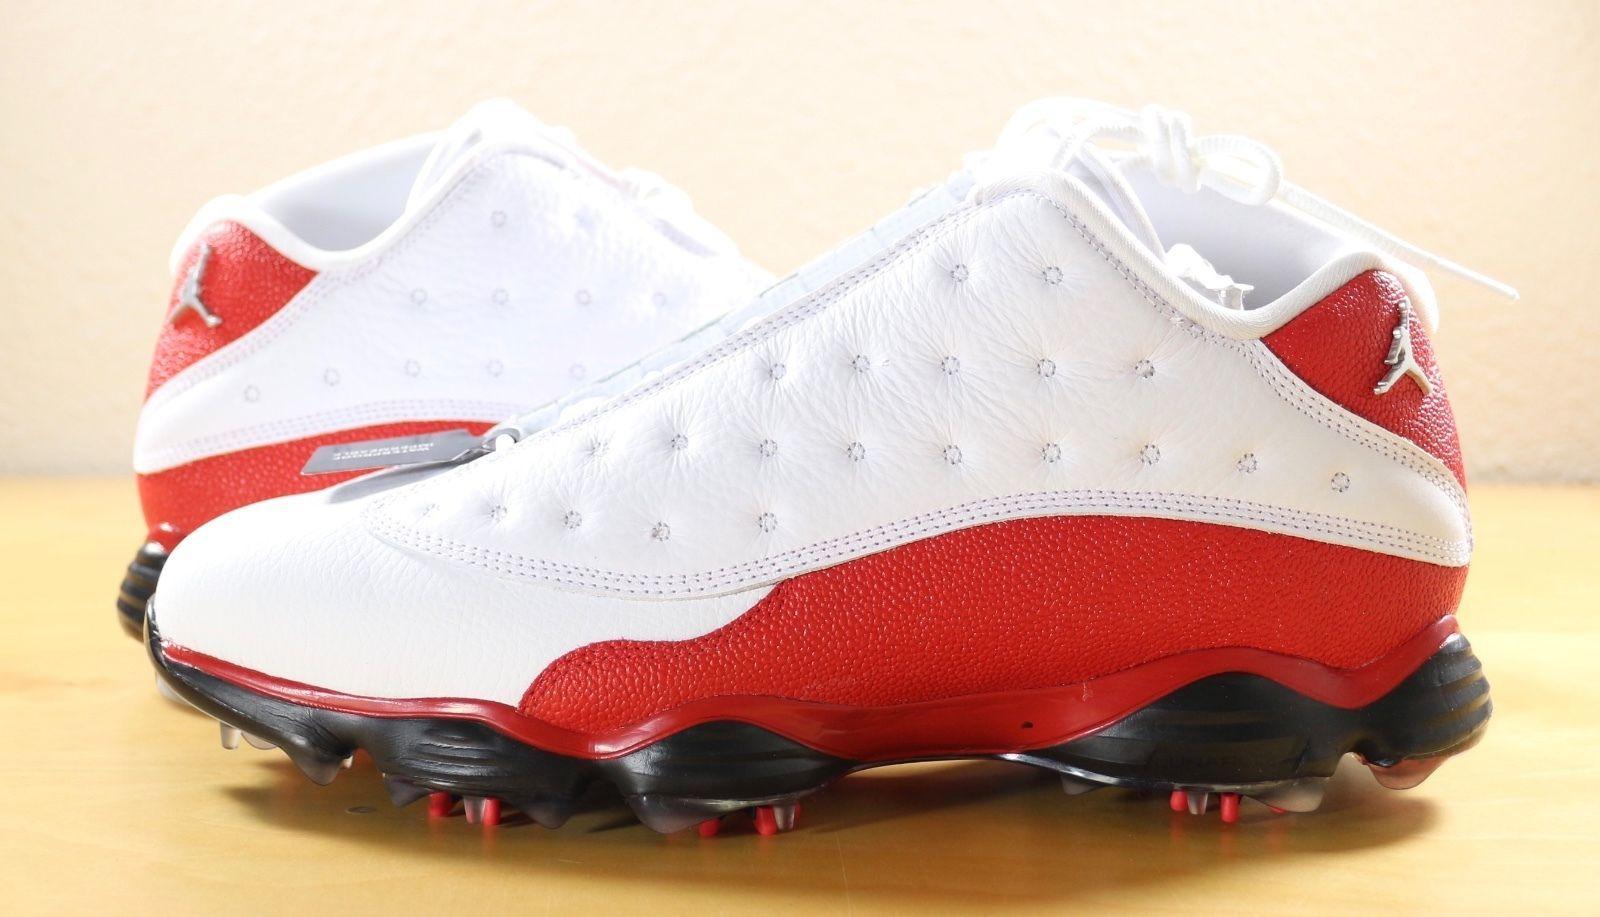 b6ea70a0b10 Nike Air Jordan 13 XIII Retro Low Golf Shoes Cleats White Red 917719-101 sz  9.5